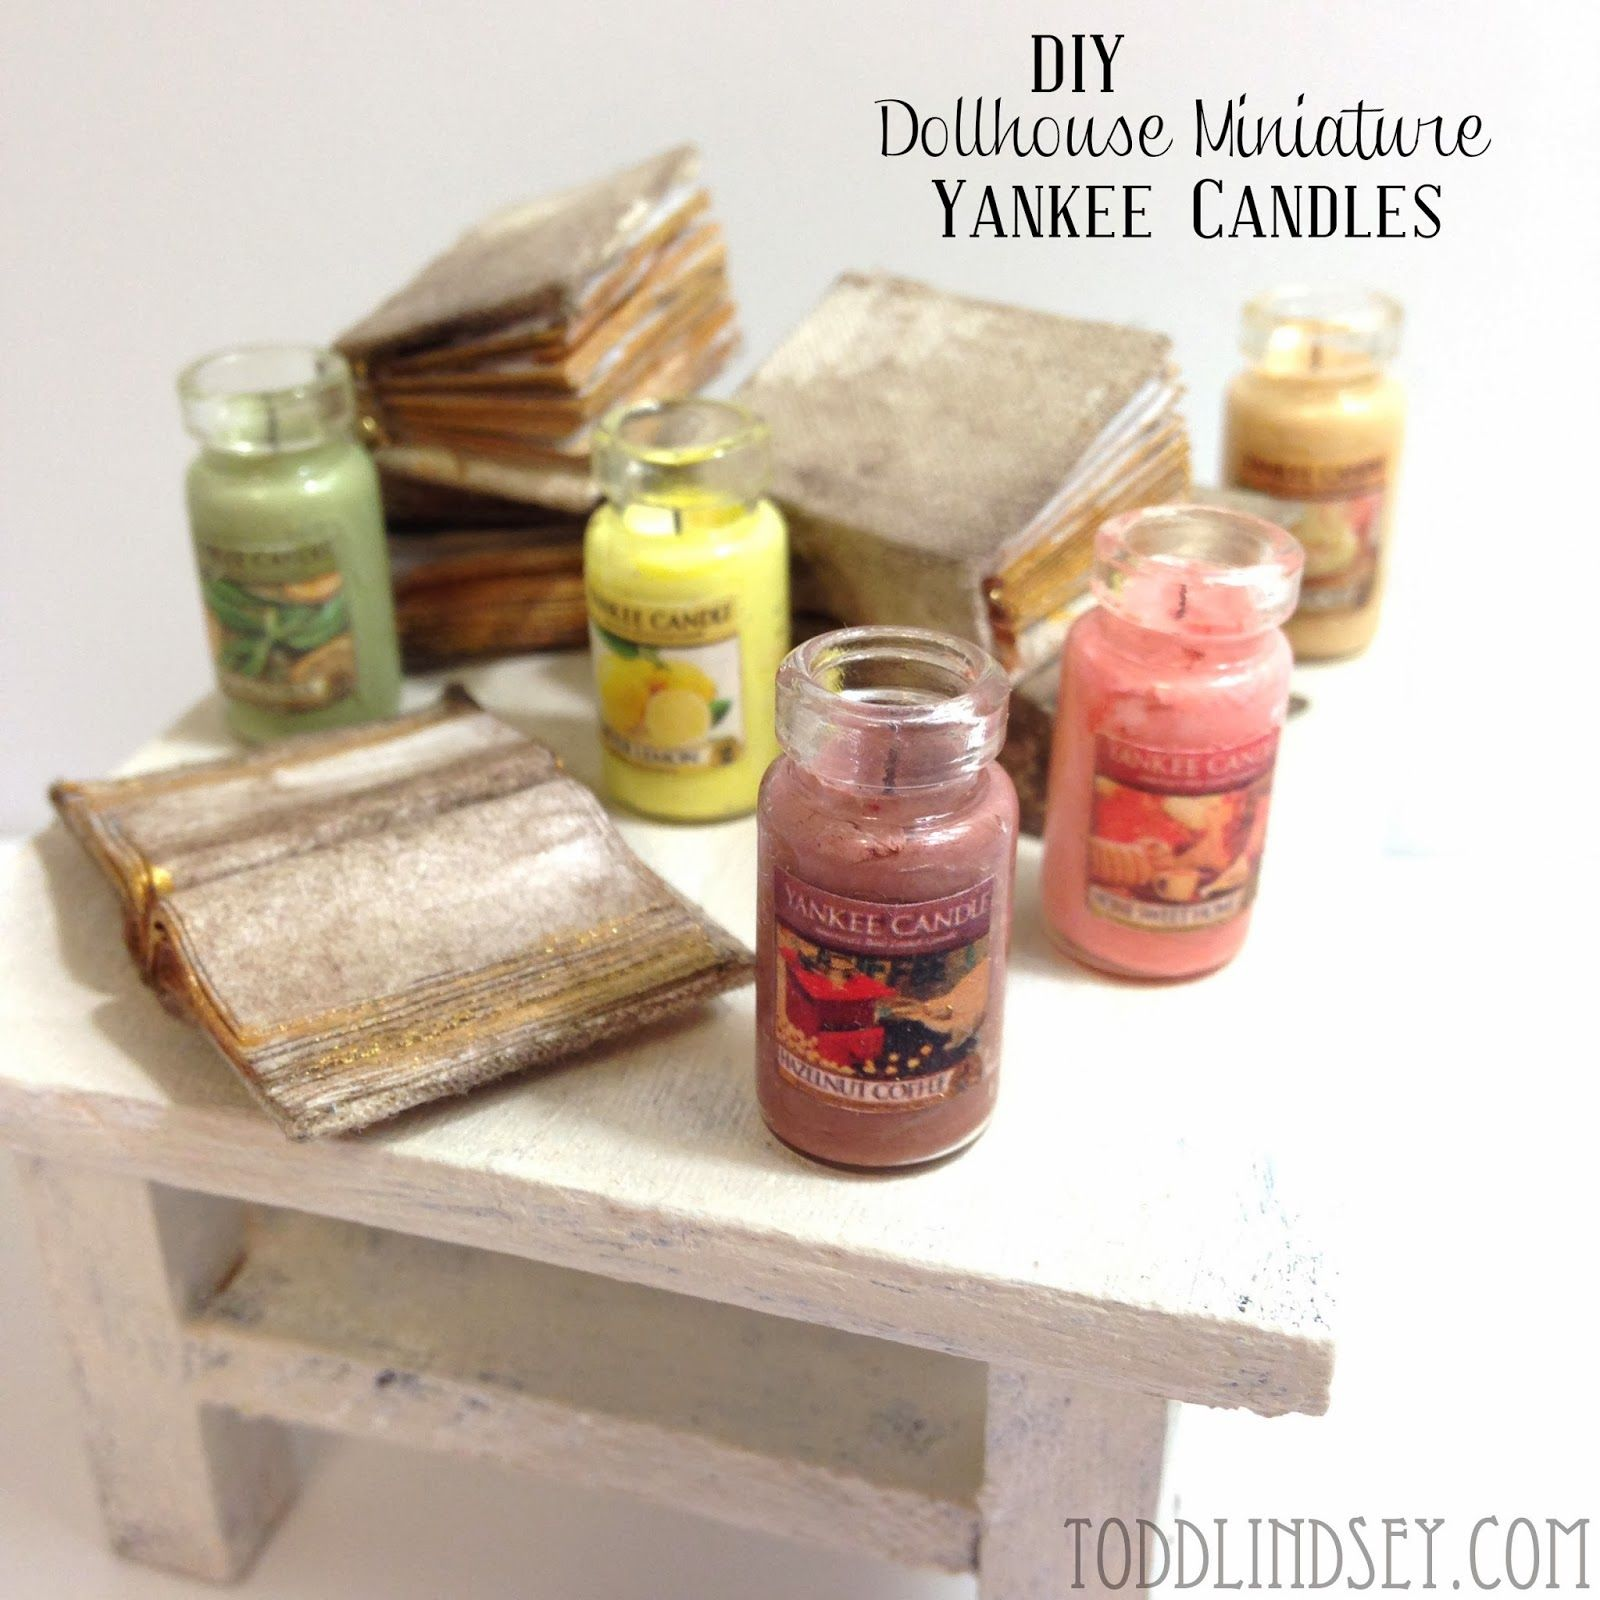 1:12 Miniature candle dollhouse diy doll house decor accessories